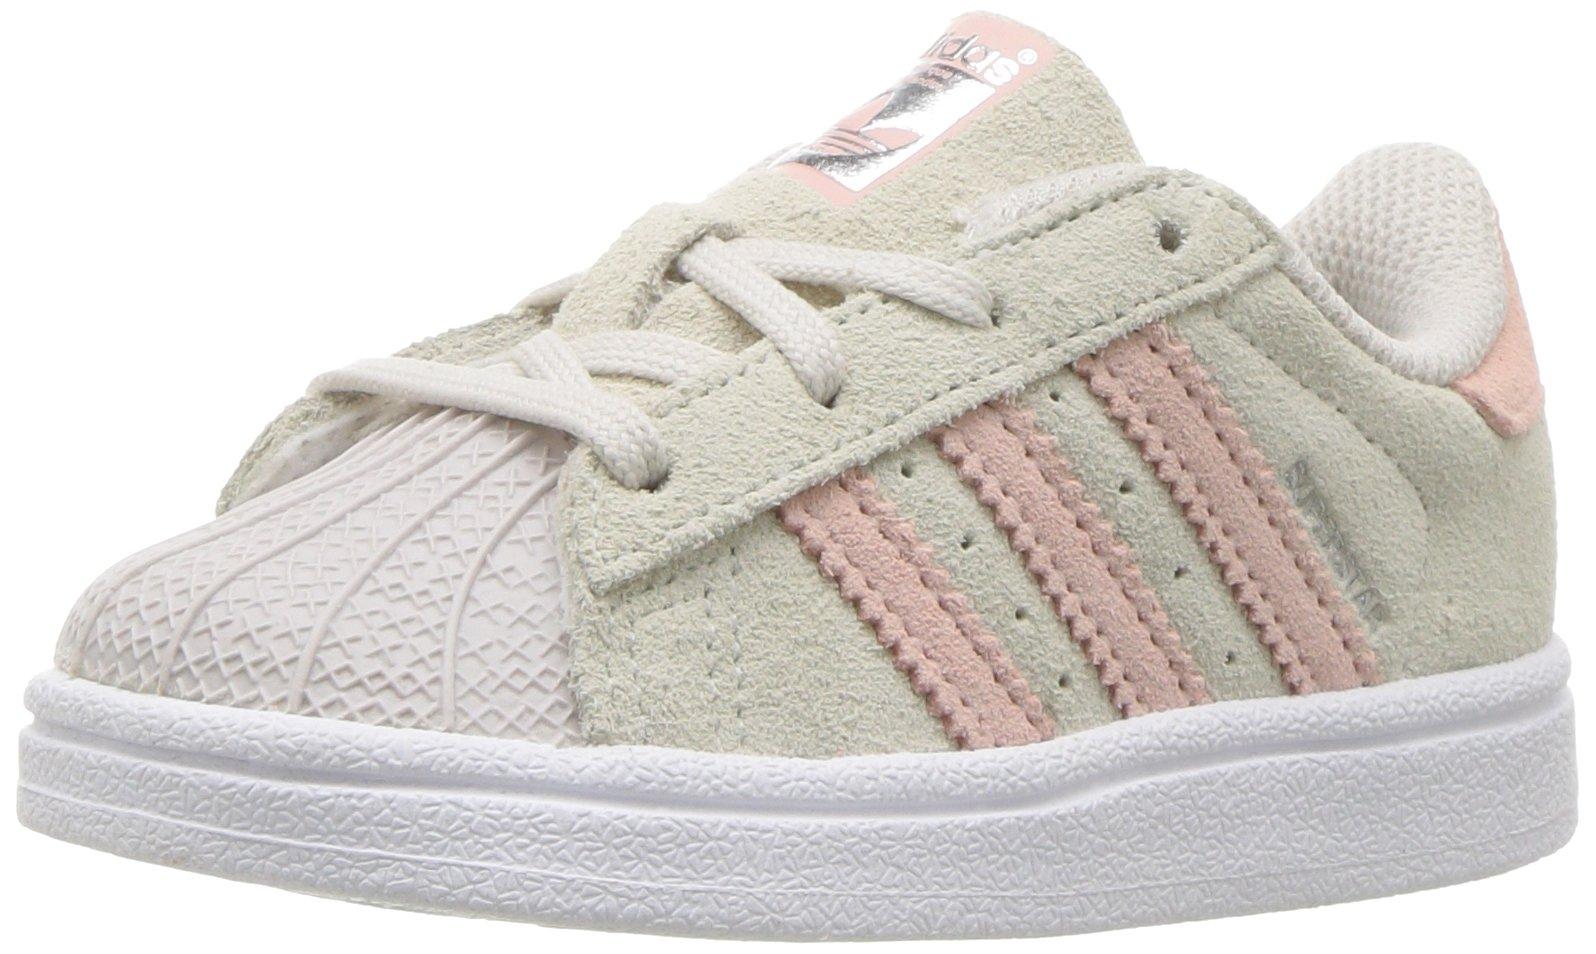 new product a1122 e00c5 Galleon - Adidas Originals Girls  Superstar I Running Shoe Pearl Grey ICE  Pink, 9 Medium US Toddler